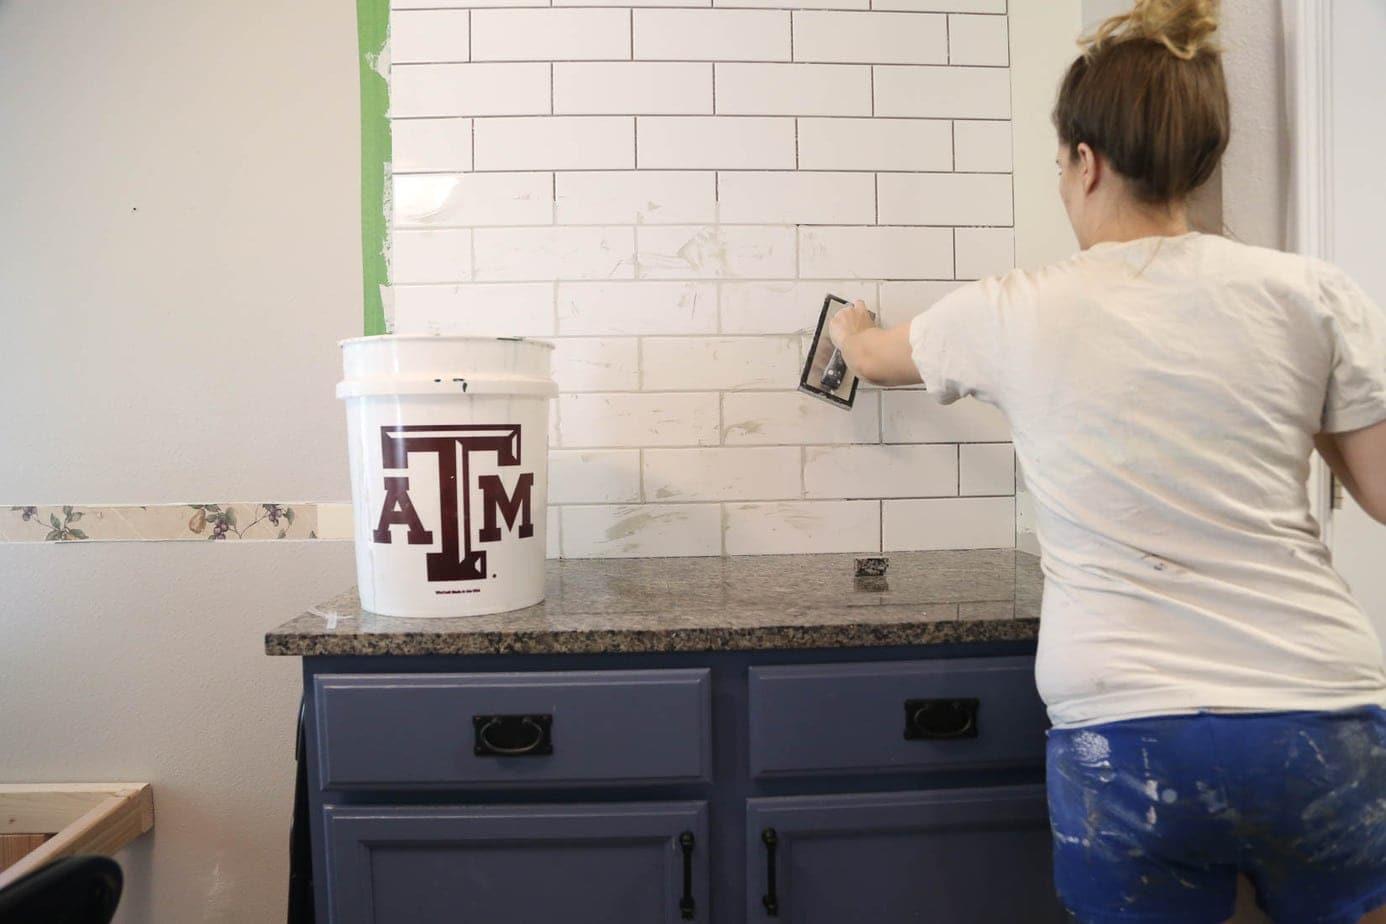 Grouting kitchen backsplash